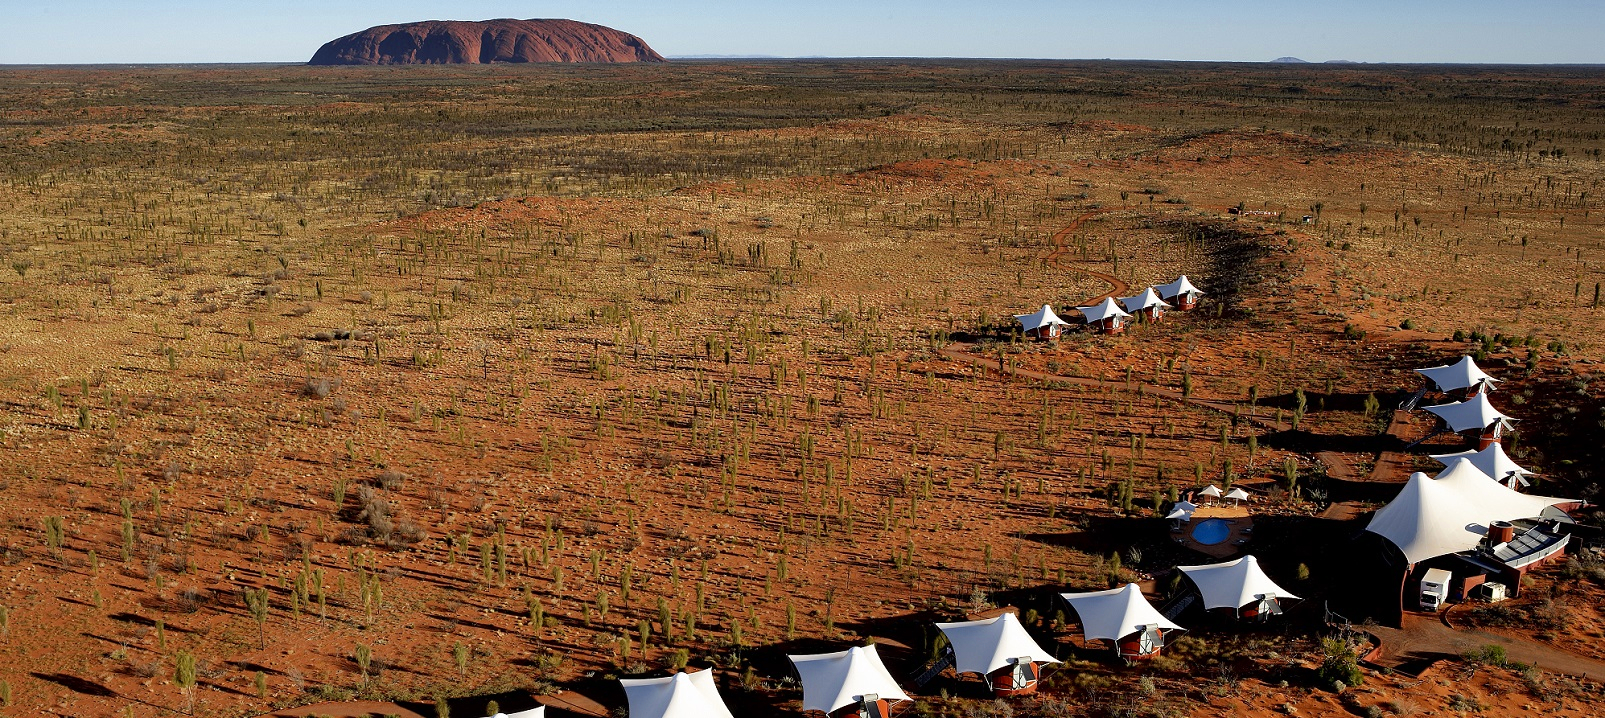 Uluru Longitude 131°